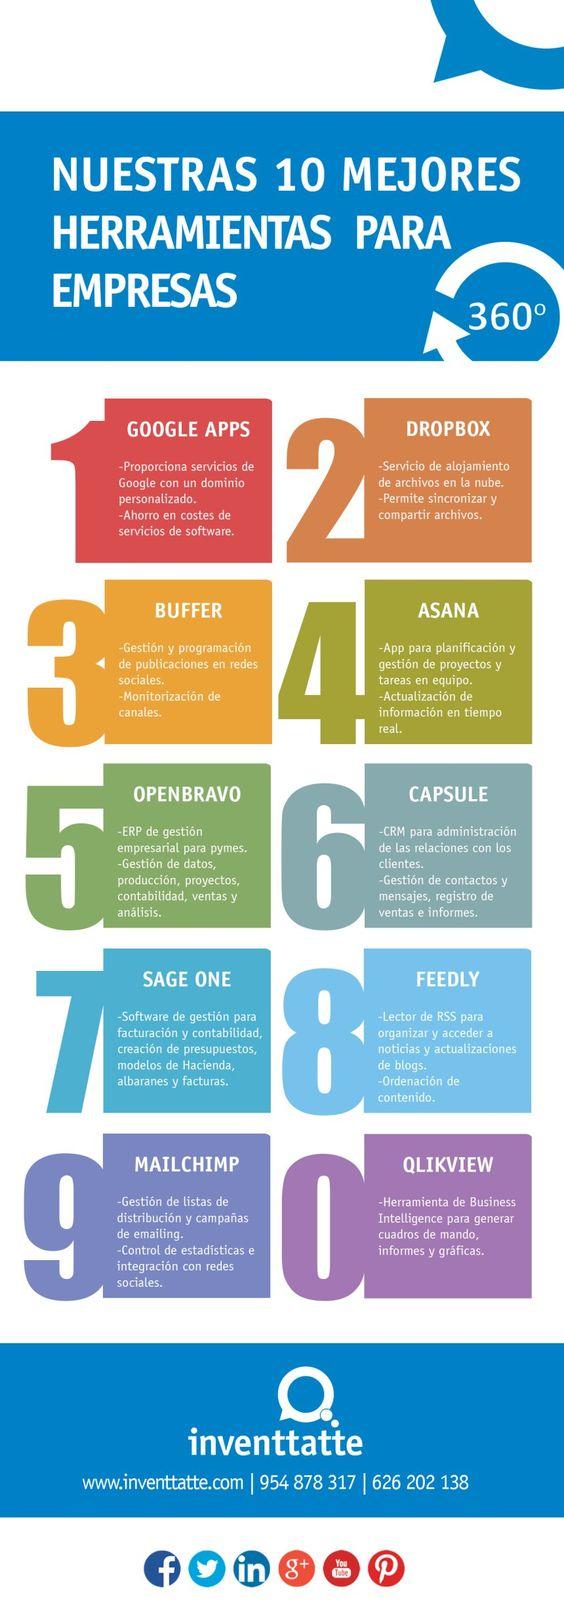 10 herramientas digitales imprescindibles para empresas #infografia #infographic